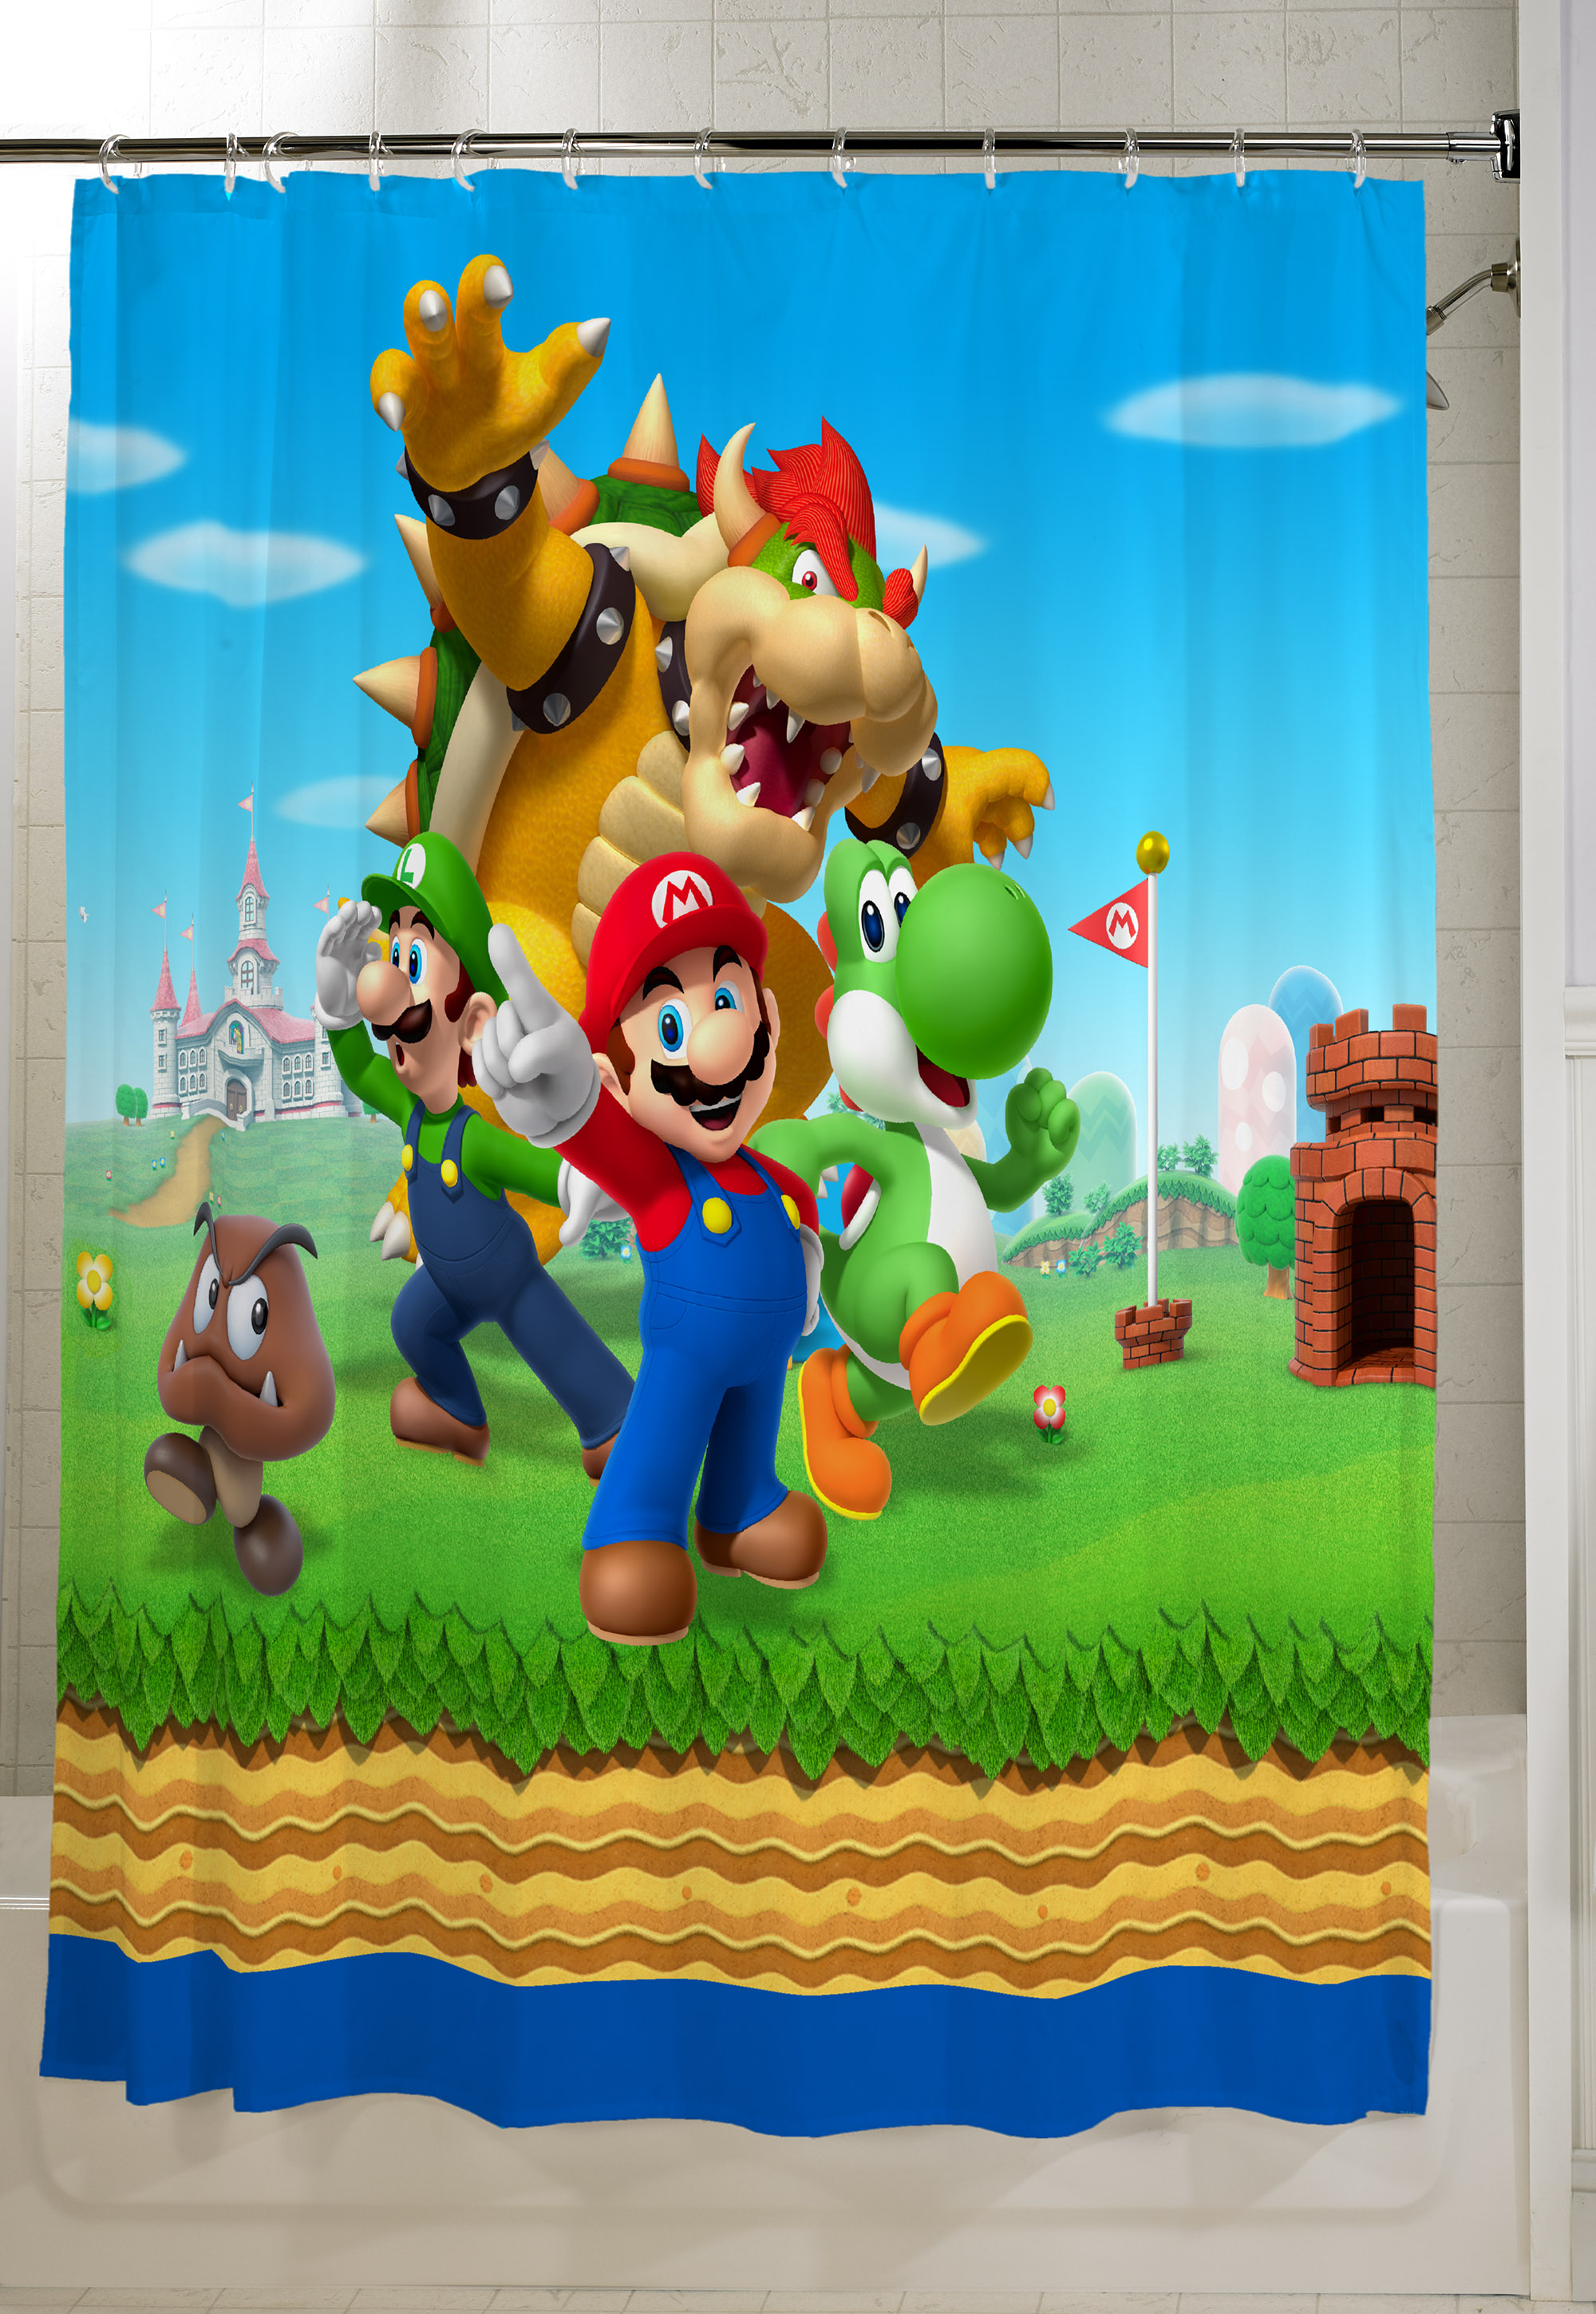 "Super Mario Kids Bathroom Decorative Fabric Shower Curtain, 72"" x 72"""